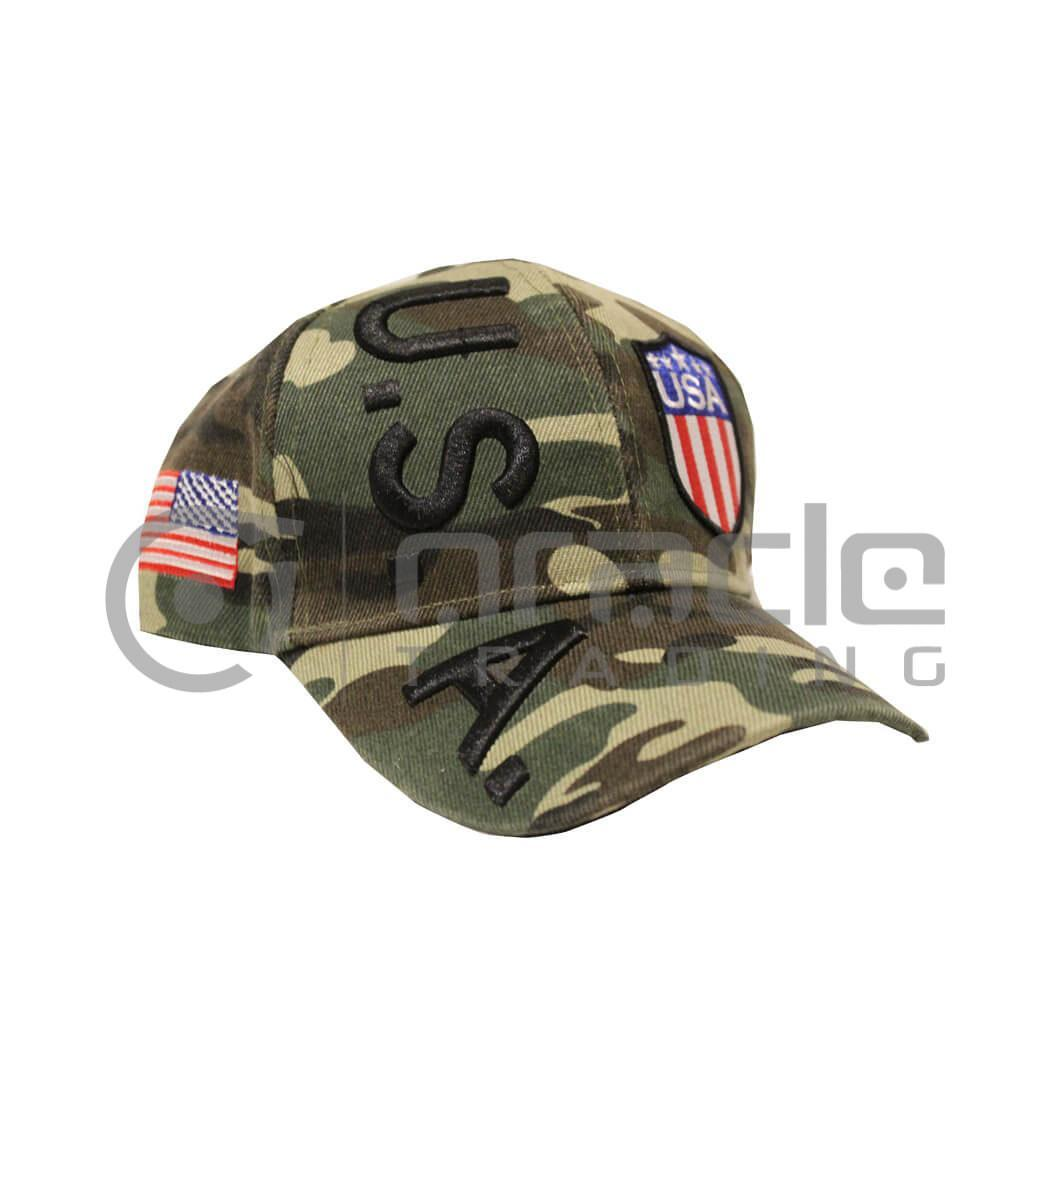 3D USA Hat - Camo